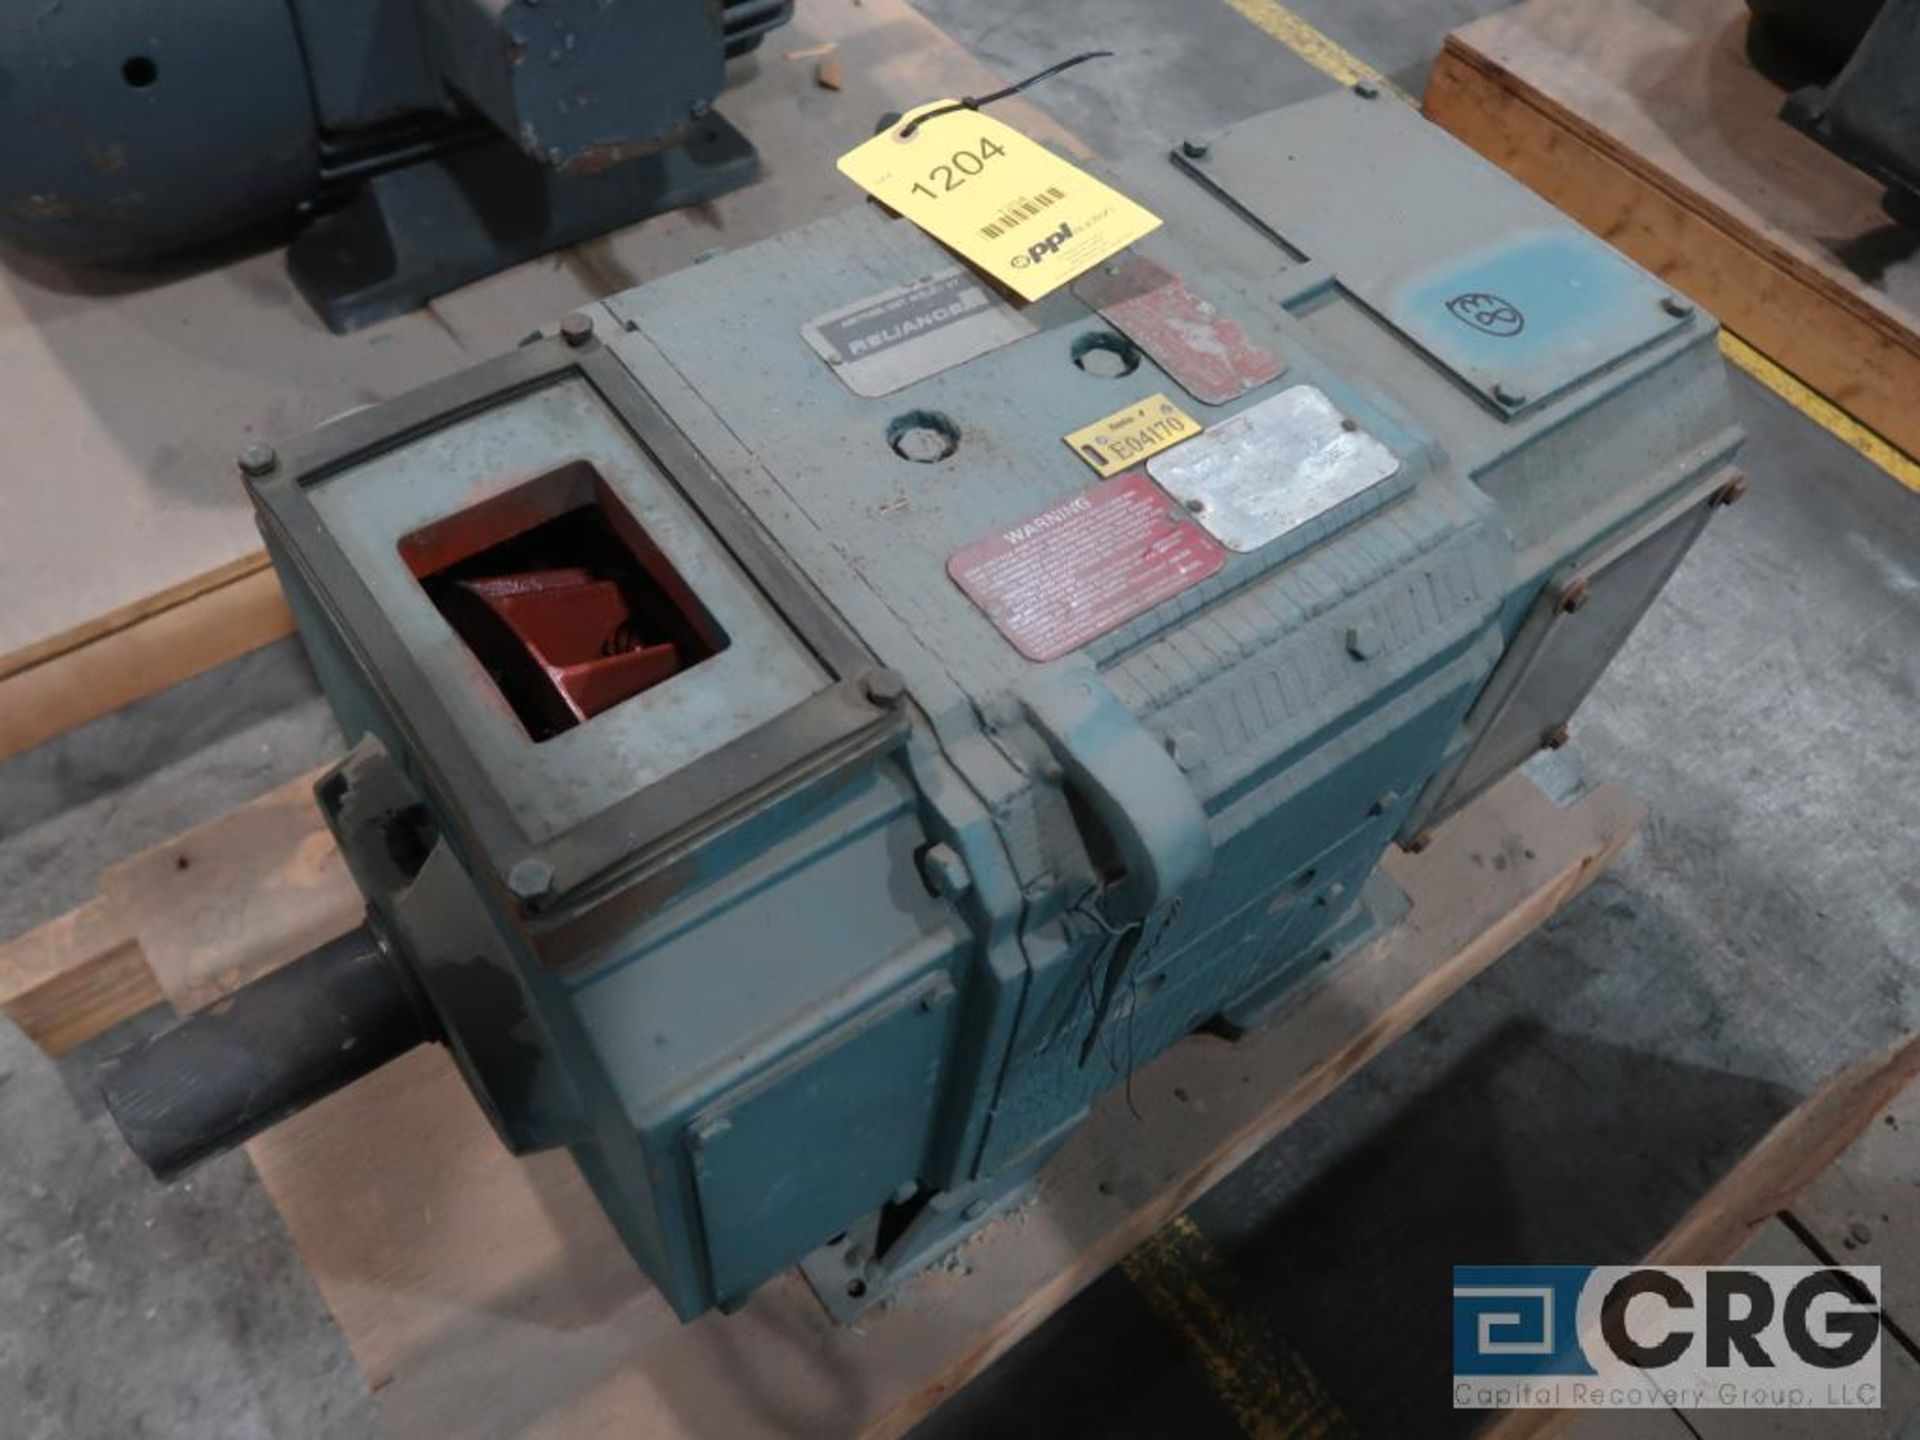 Reliance electric DC motor, 75 HP, 1,750/2,300 RPMs, 240 volt, 3 ph., B0328ATZ frame (Finish